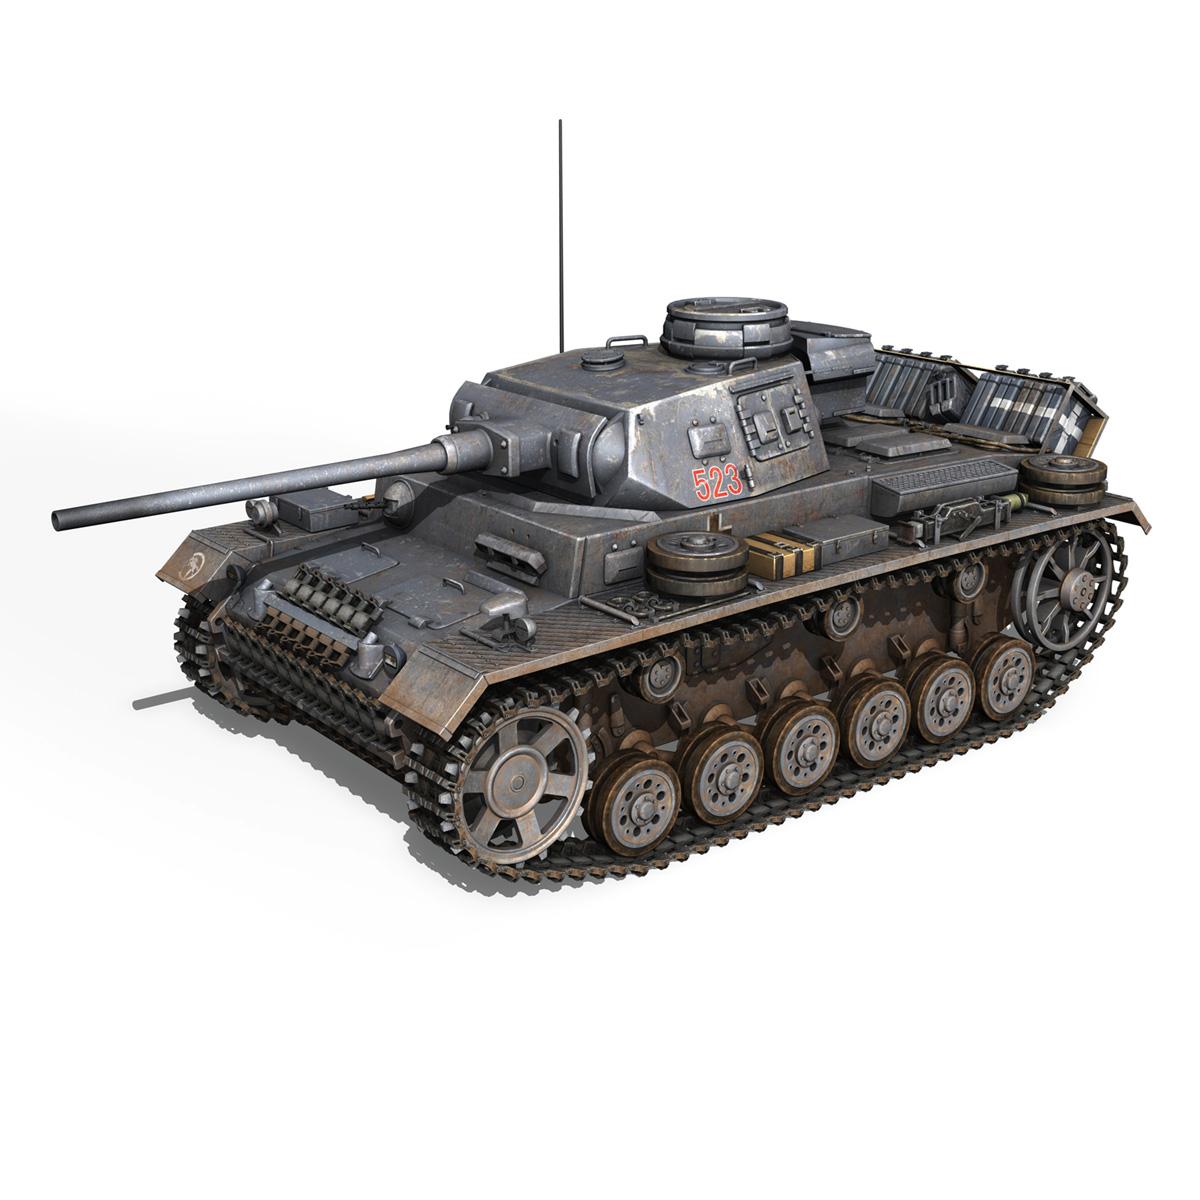 pzkpfw iii – panzer 3 – ausf.j – 523 3d model 3ds fbx c4d lwo obj 189076